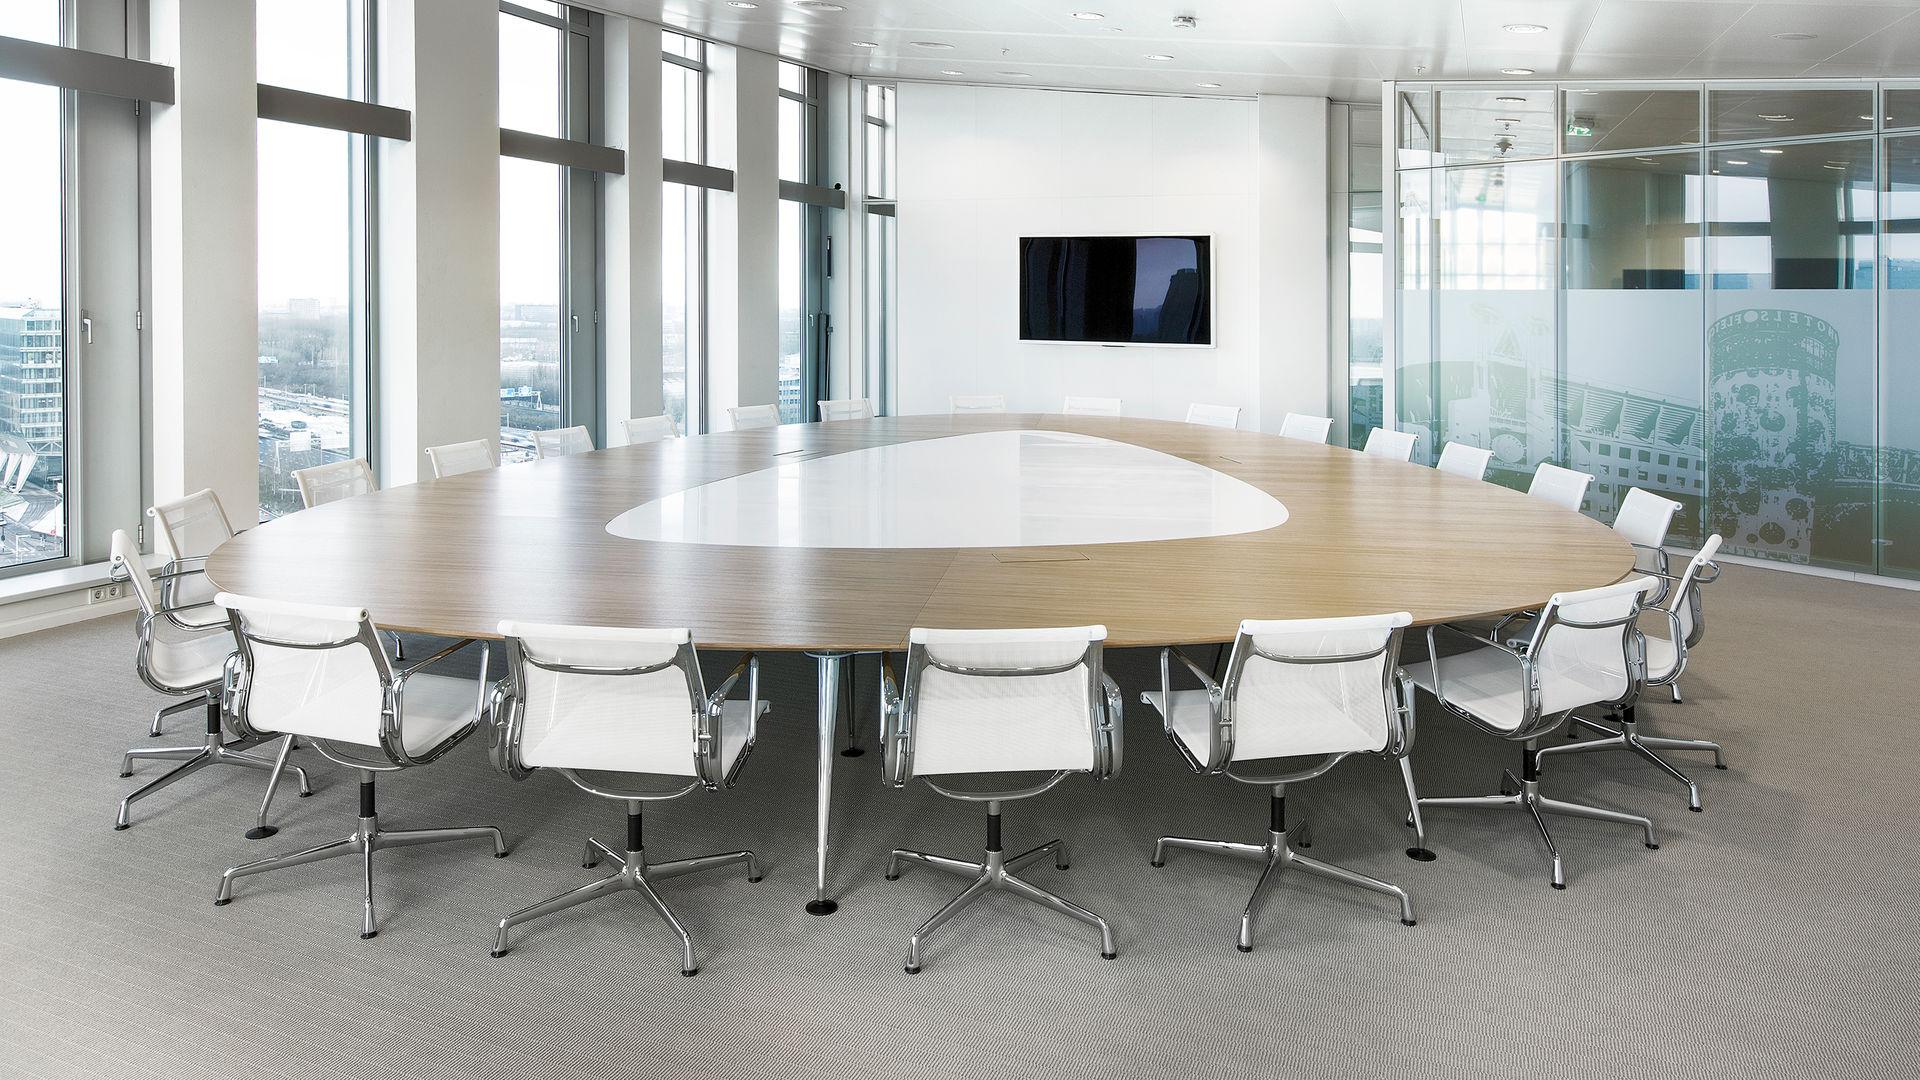 Office Deloitte Amsterdam: The Edge_web_16-9